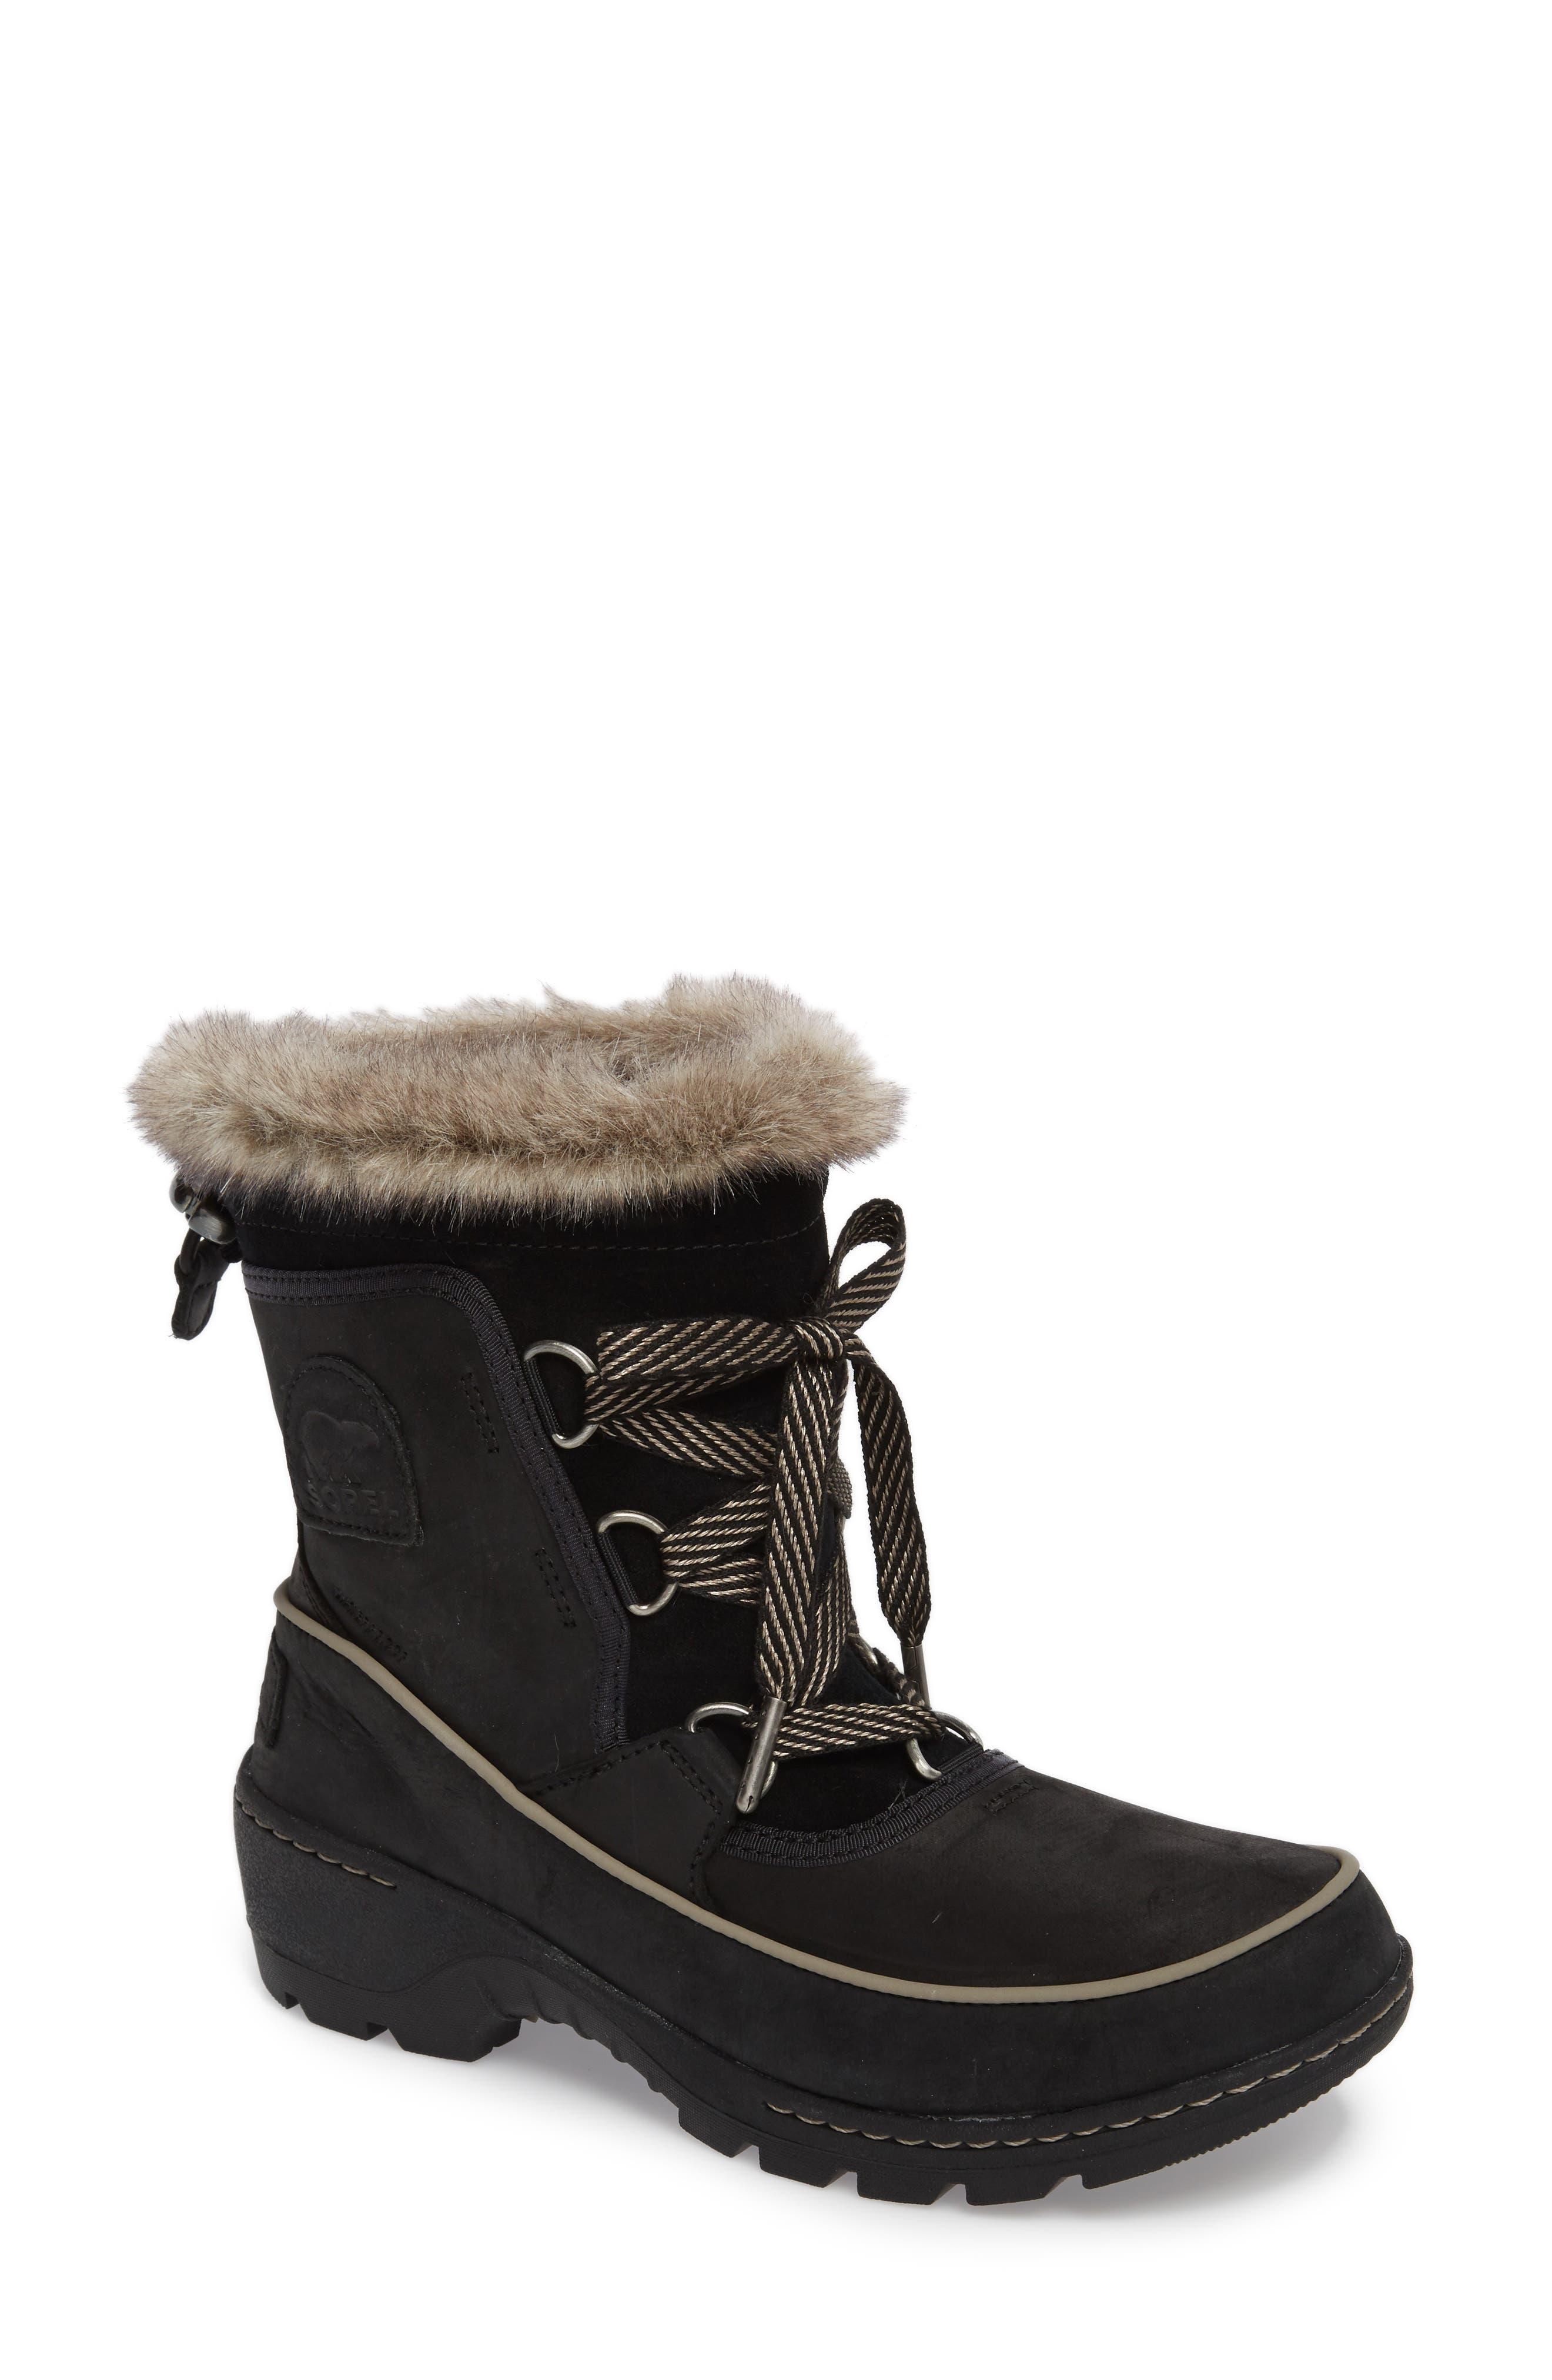 Alternate Image 1 Selected - SOREL Tivoli II Insulated Winter Boot with Faux Fur Trim (Women)